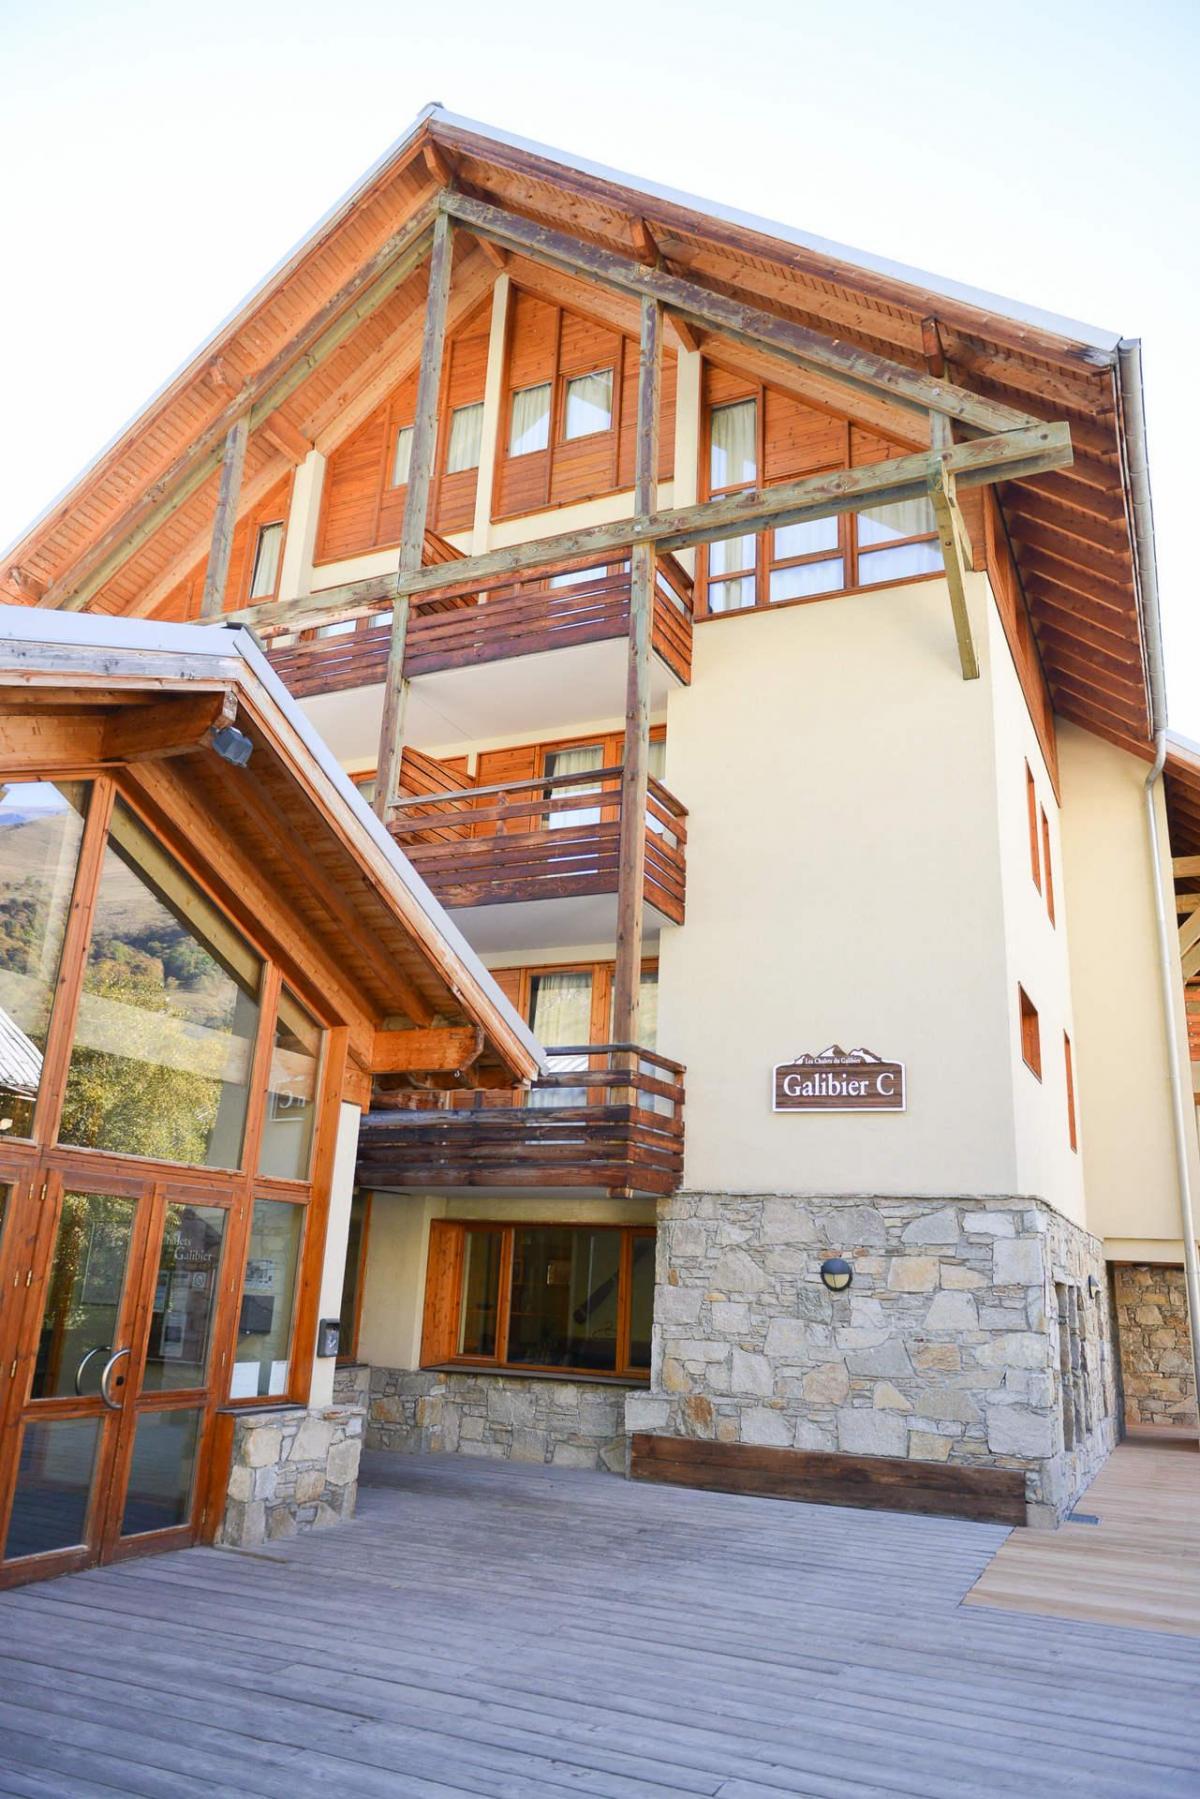 chalets du galibier valloire location vacances ski valloire ski planet. Black Bedroom Furniture Sets. Home Design Ideas